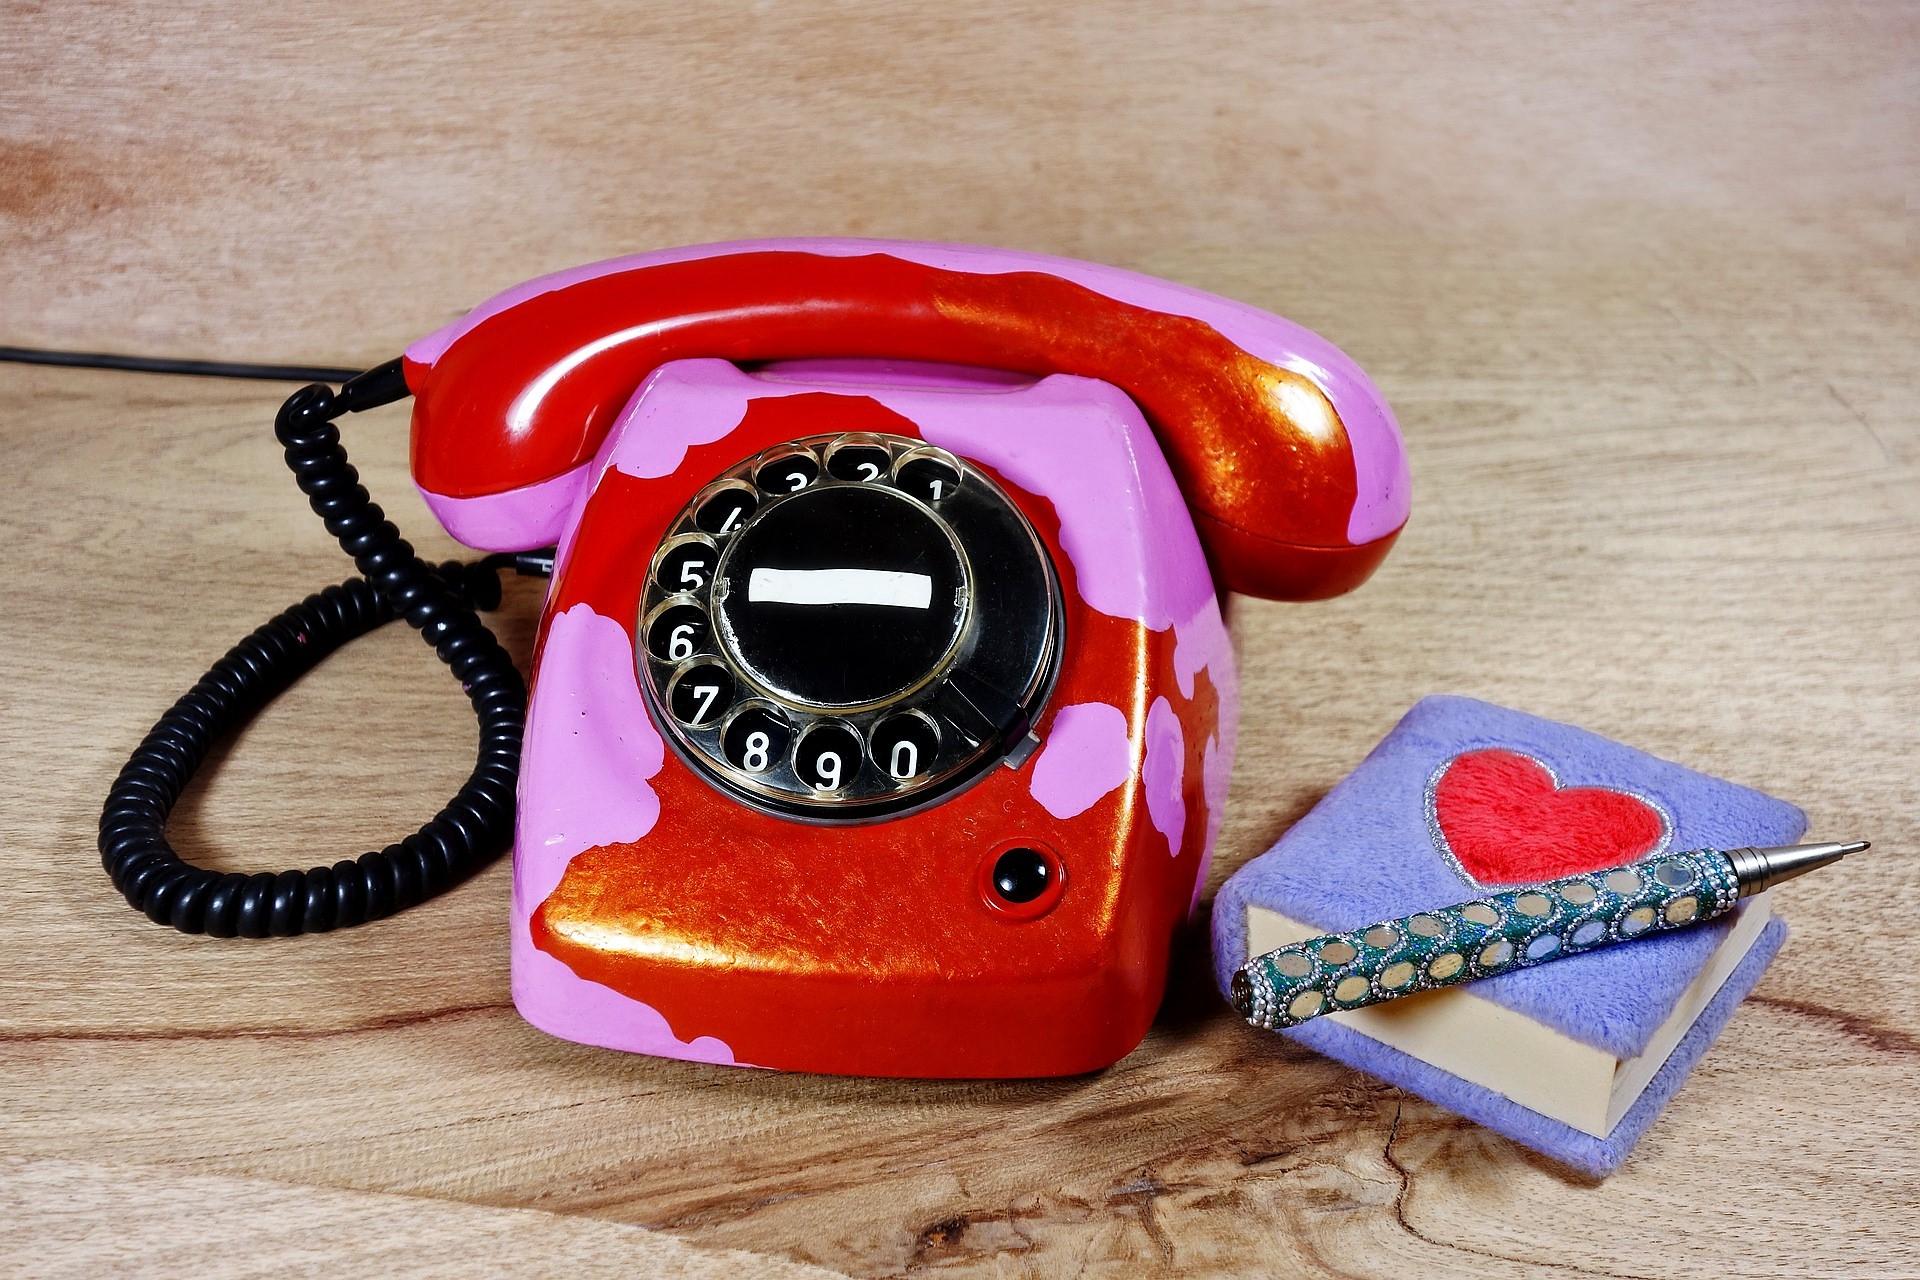 Generation Smartphone, Kommunikation, Telefon, Waehlscheibe, Relikt, Titel